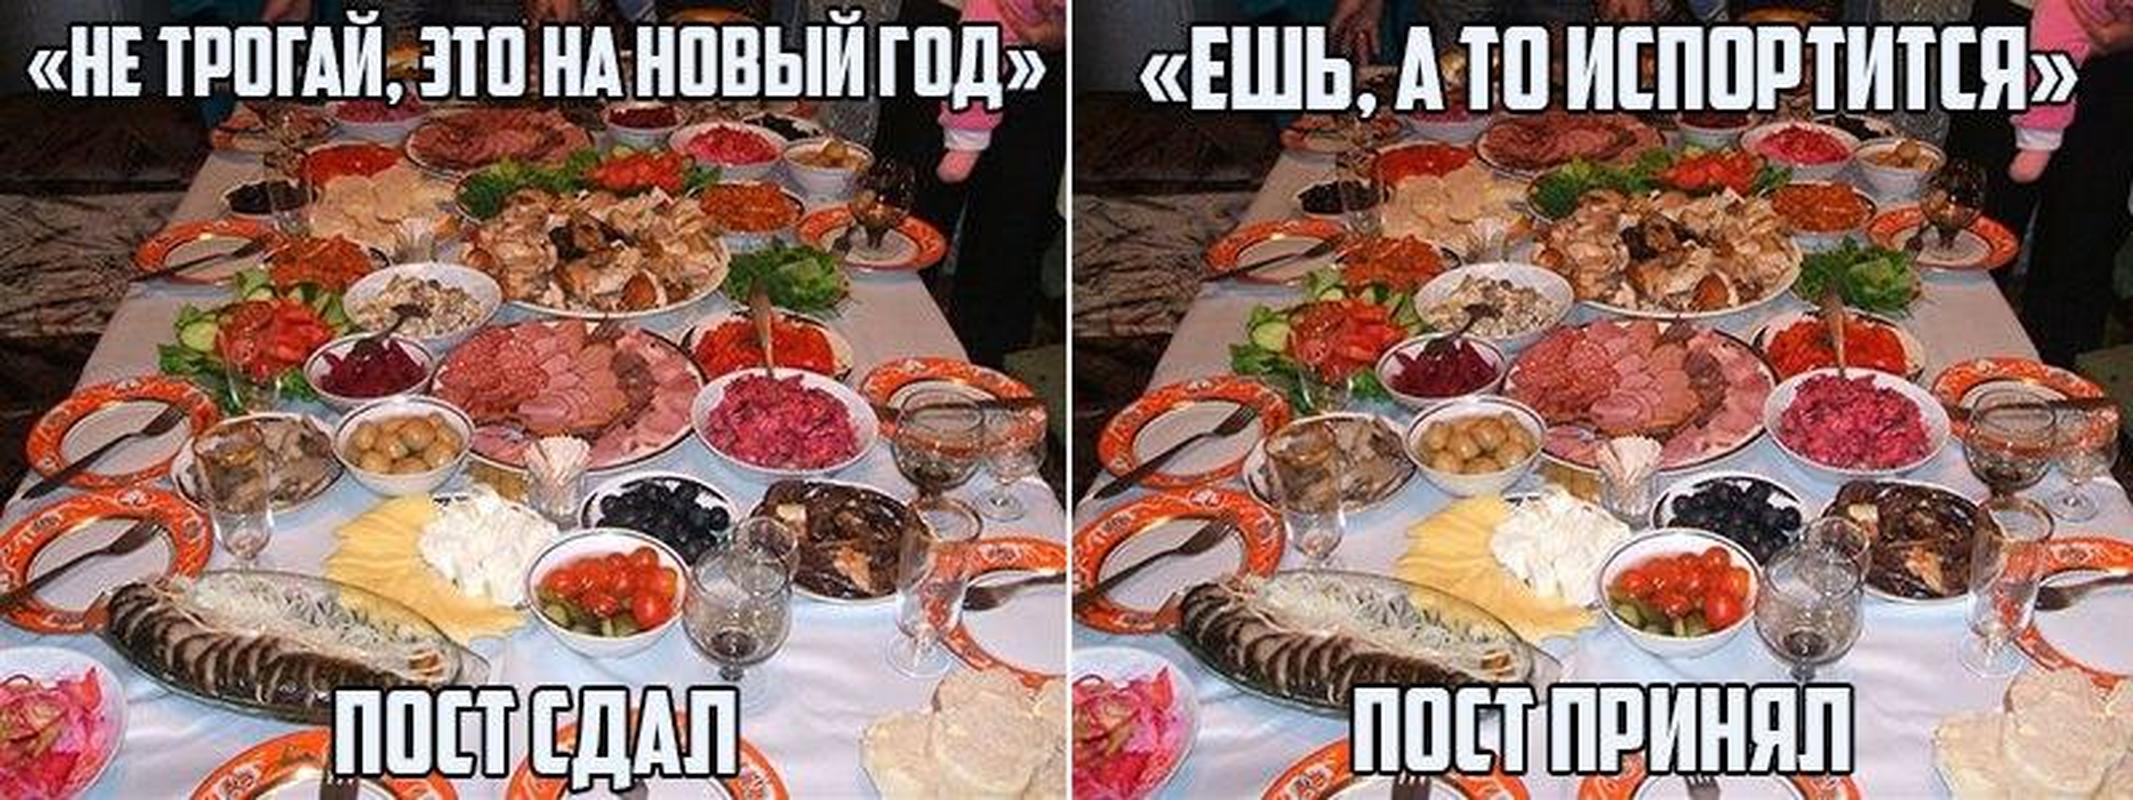 http://s3.uploads.ru/fnLUM.jpg